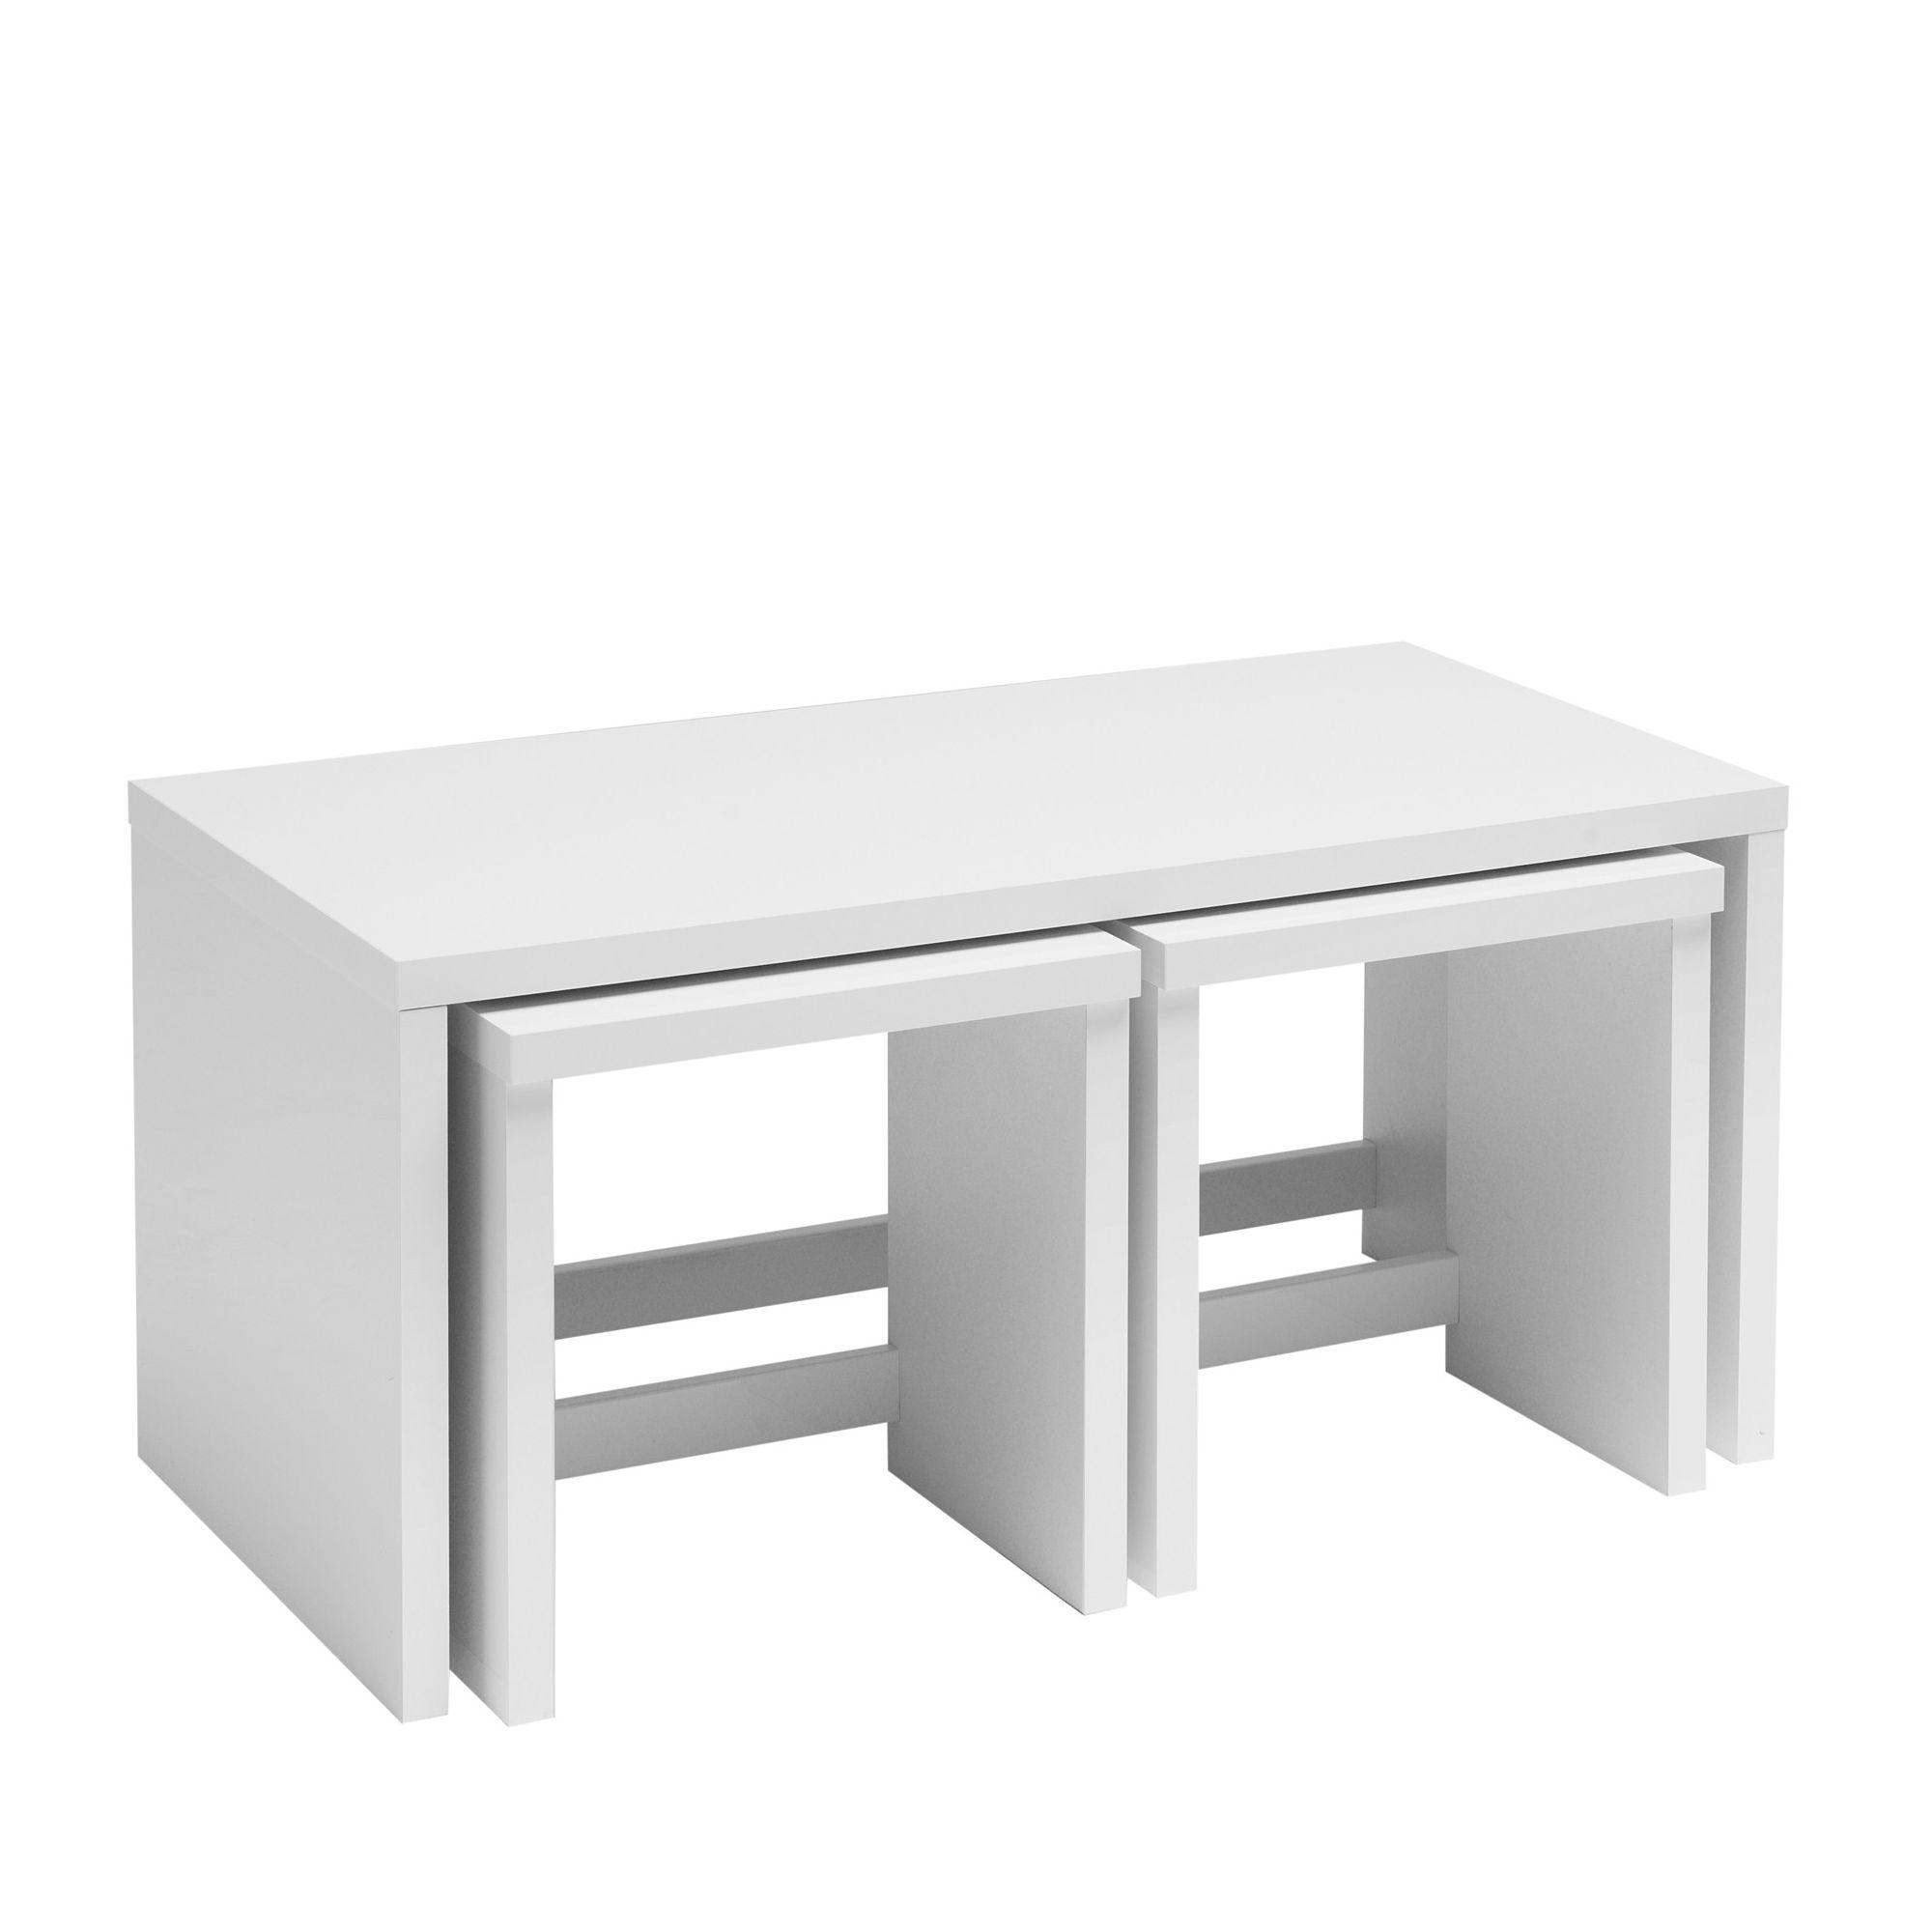 Caxton Manhattan Long John Table in White Gloss at Tesco Direct